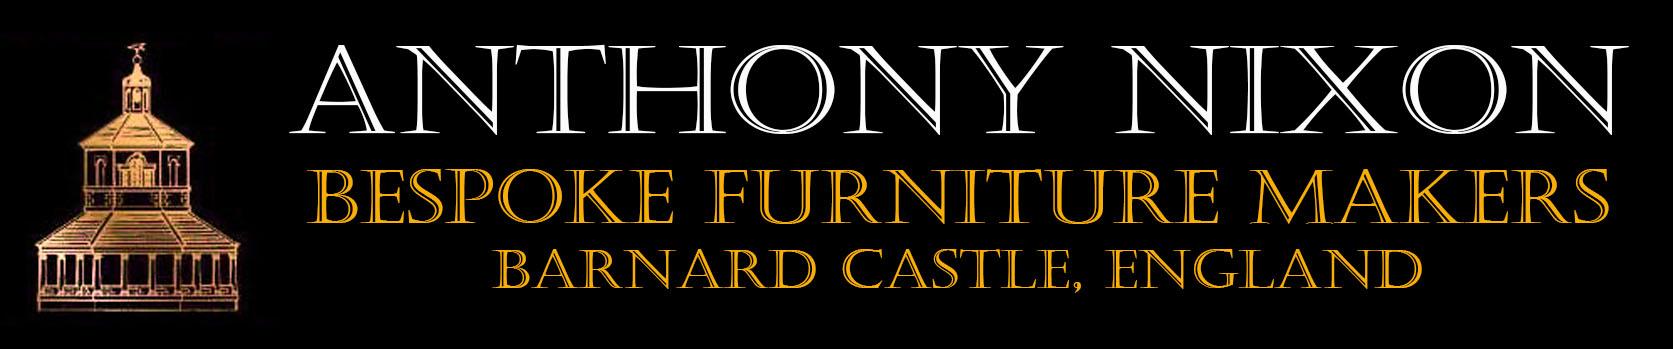 Anthony Nixon Furniture